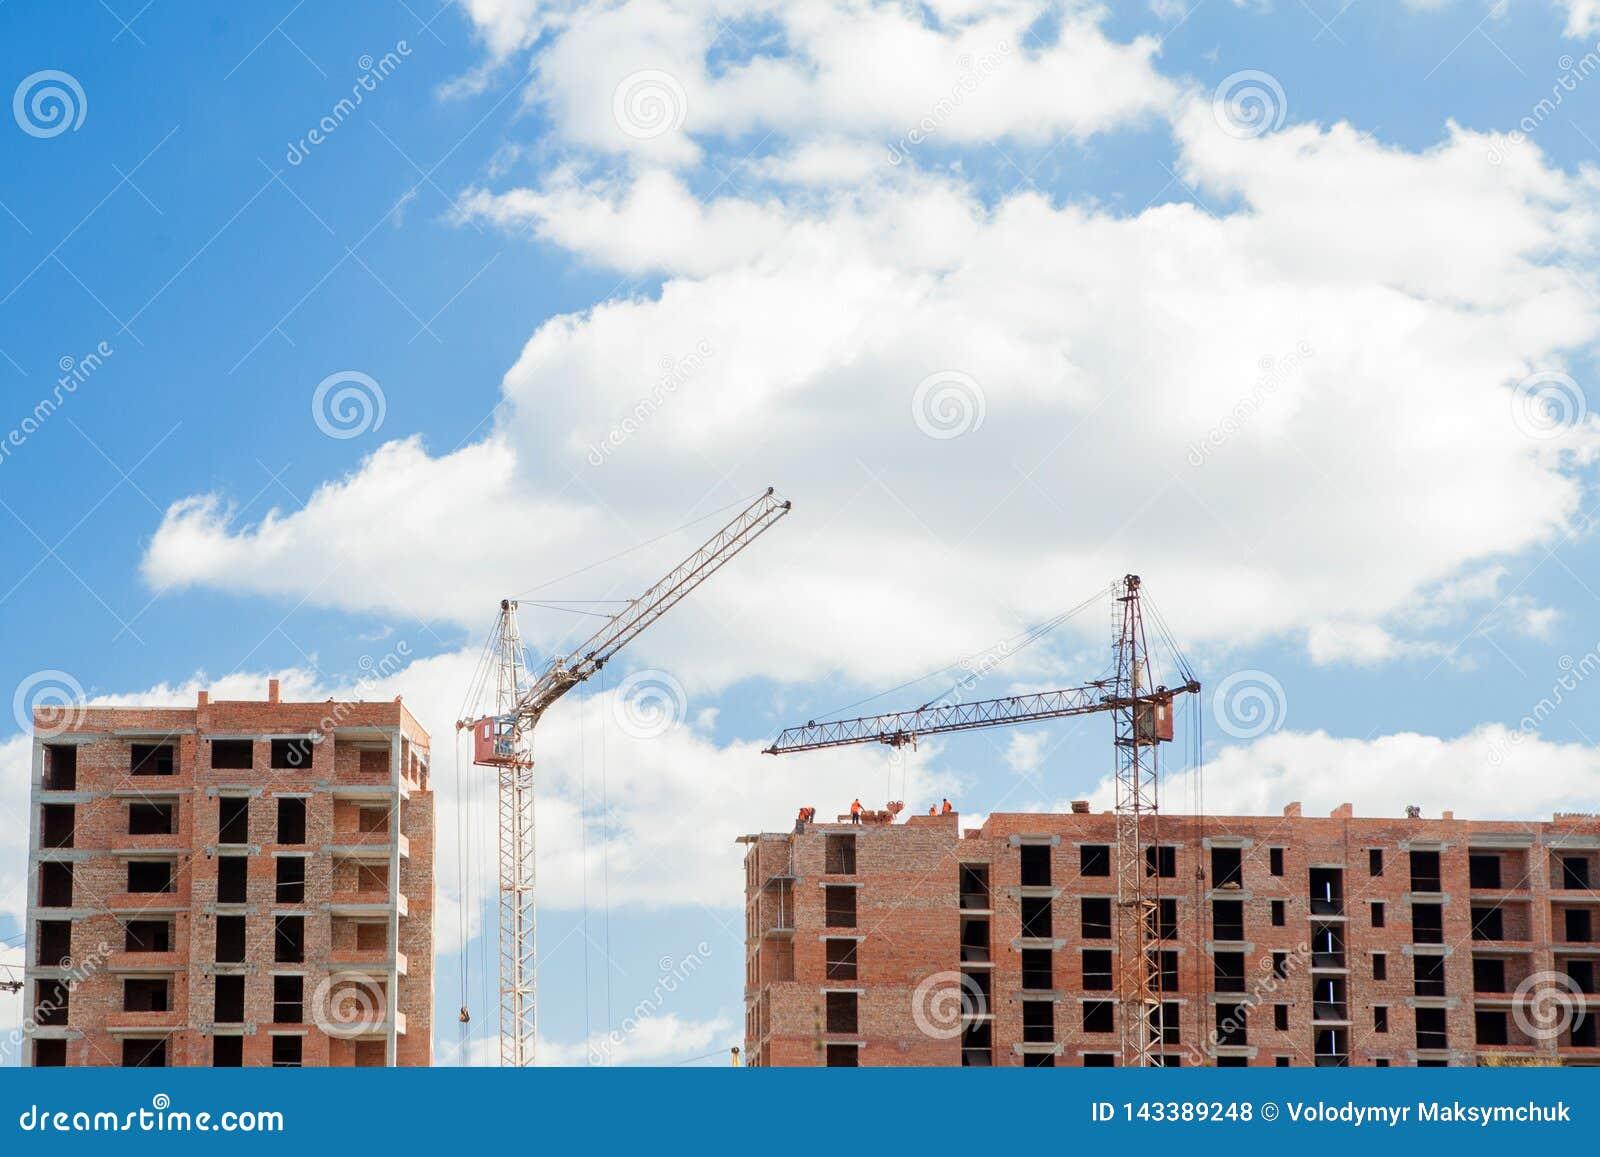 High-rise multi-storey buildings under construction. Tower cranes near building. Activity, architecture, development process,